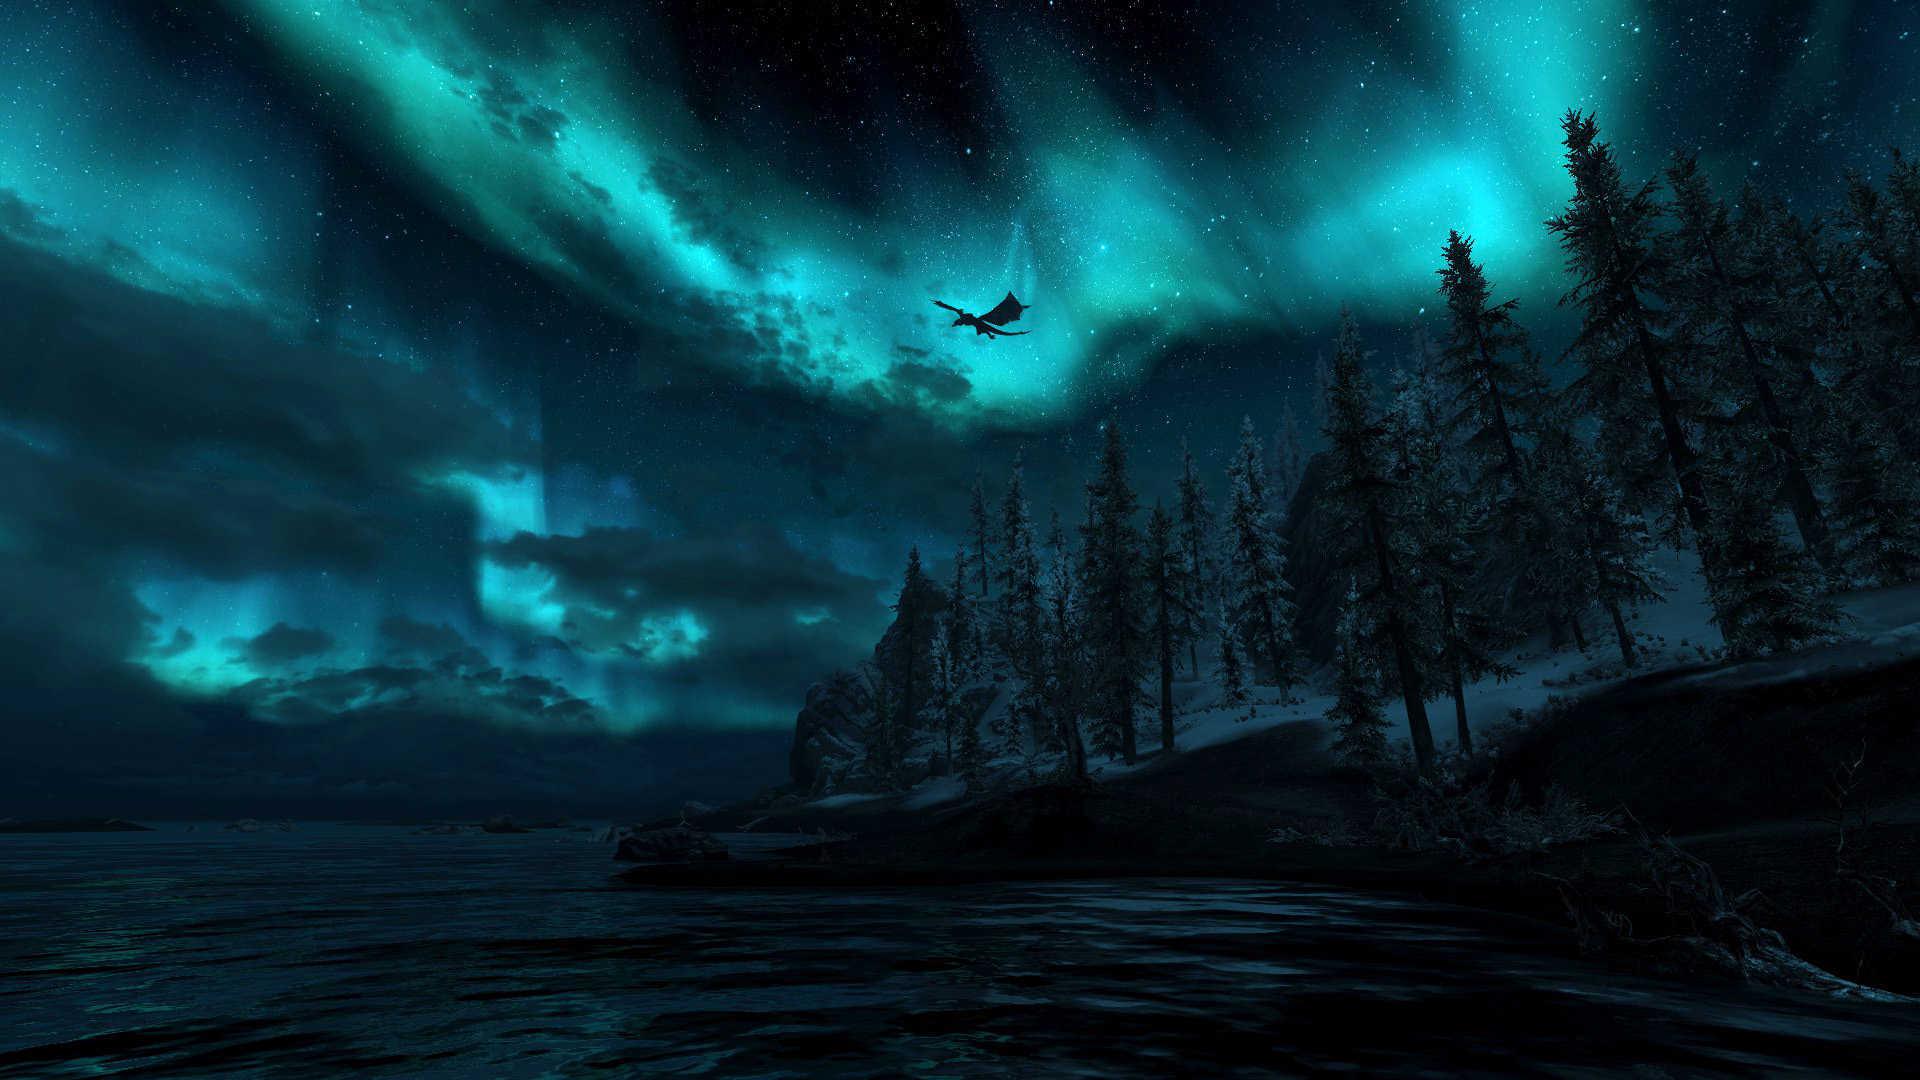 Games The Elder Scrolls Skyrim Wallpaper Desktop Phone Tablet V